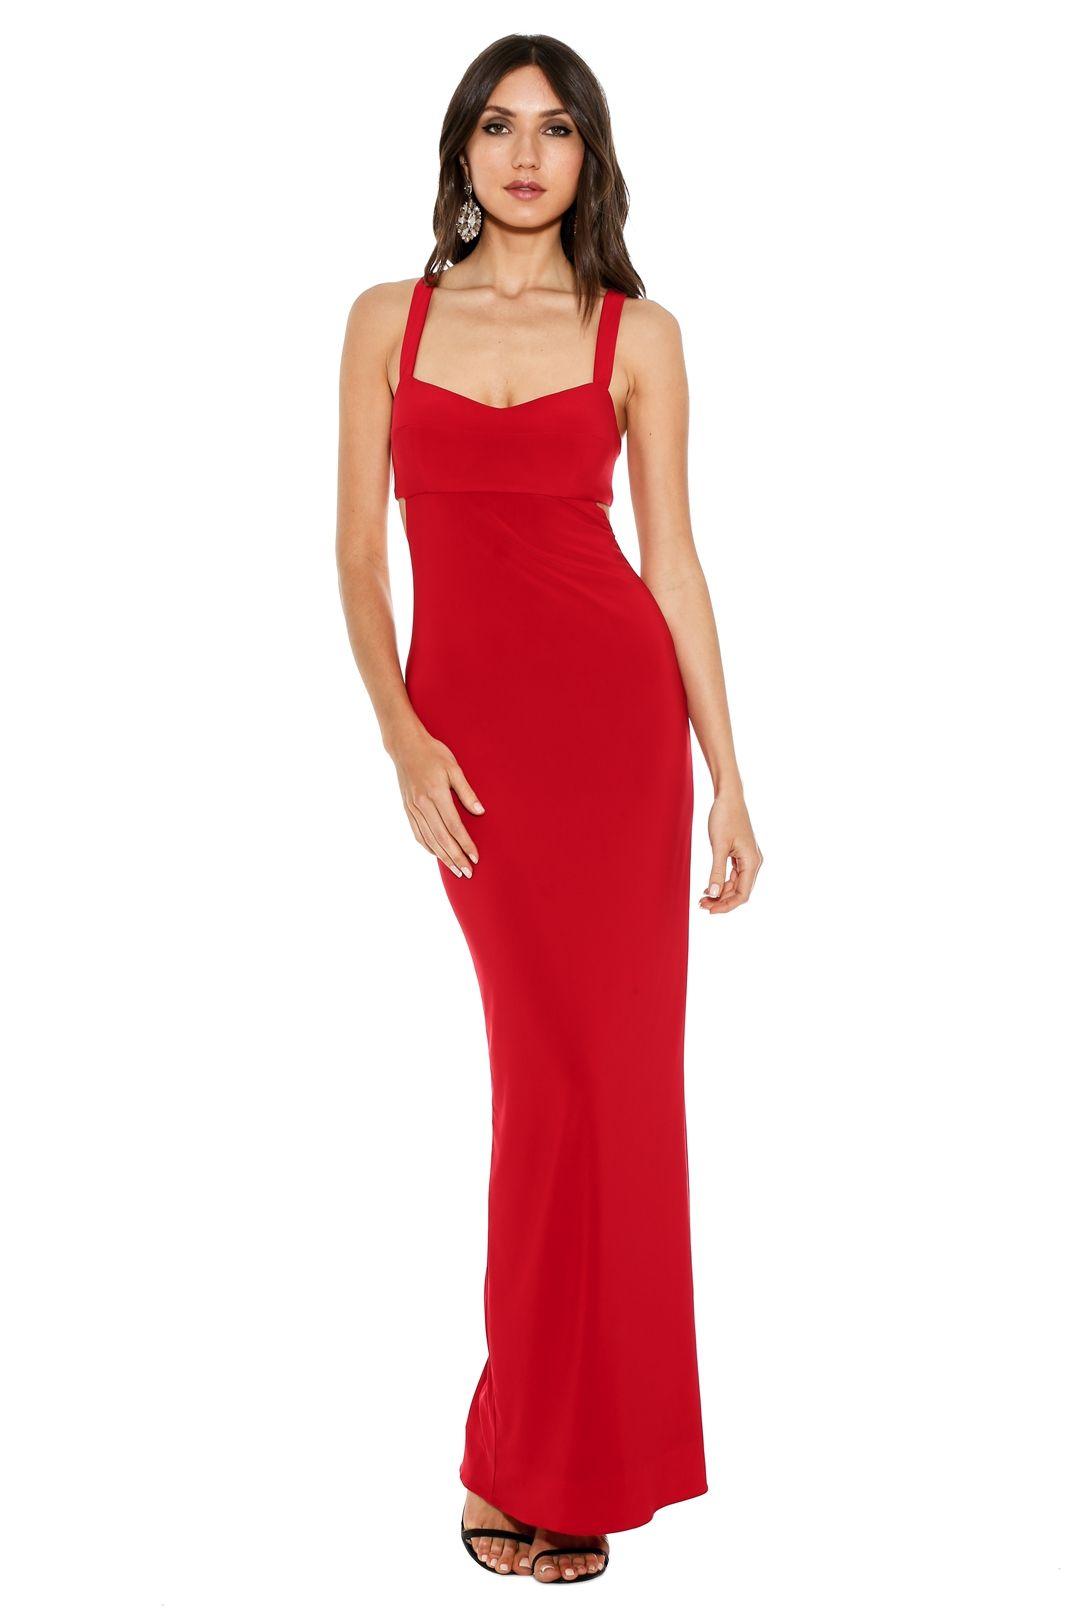 George - Jamelia Dress - Red - Front